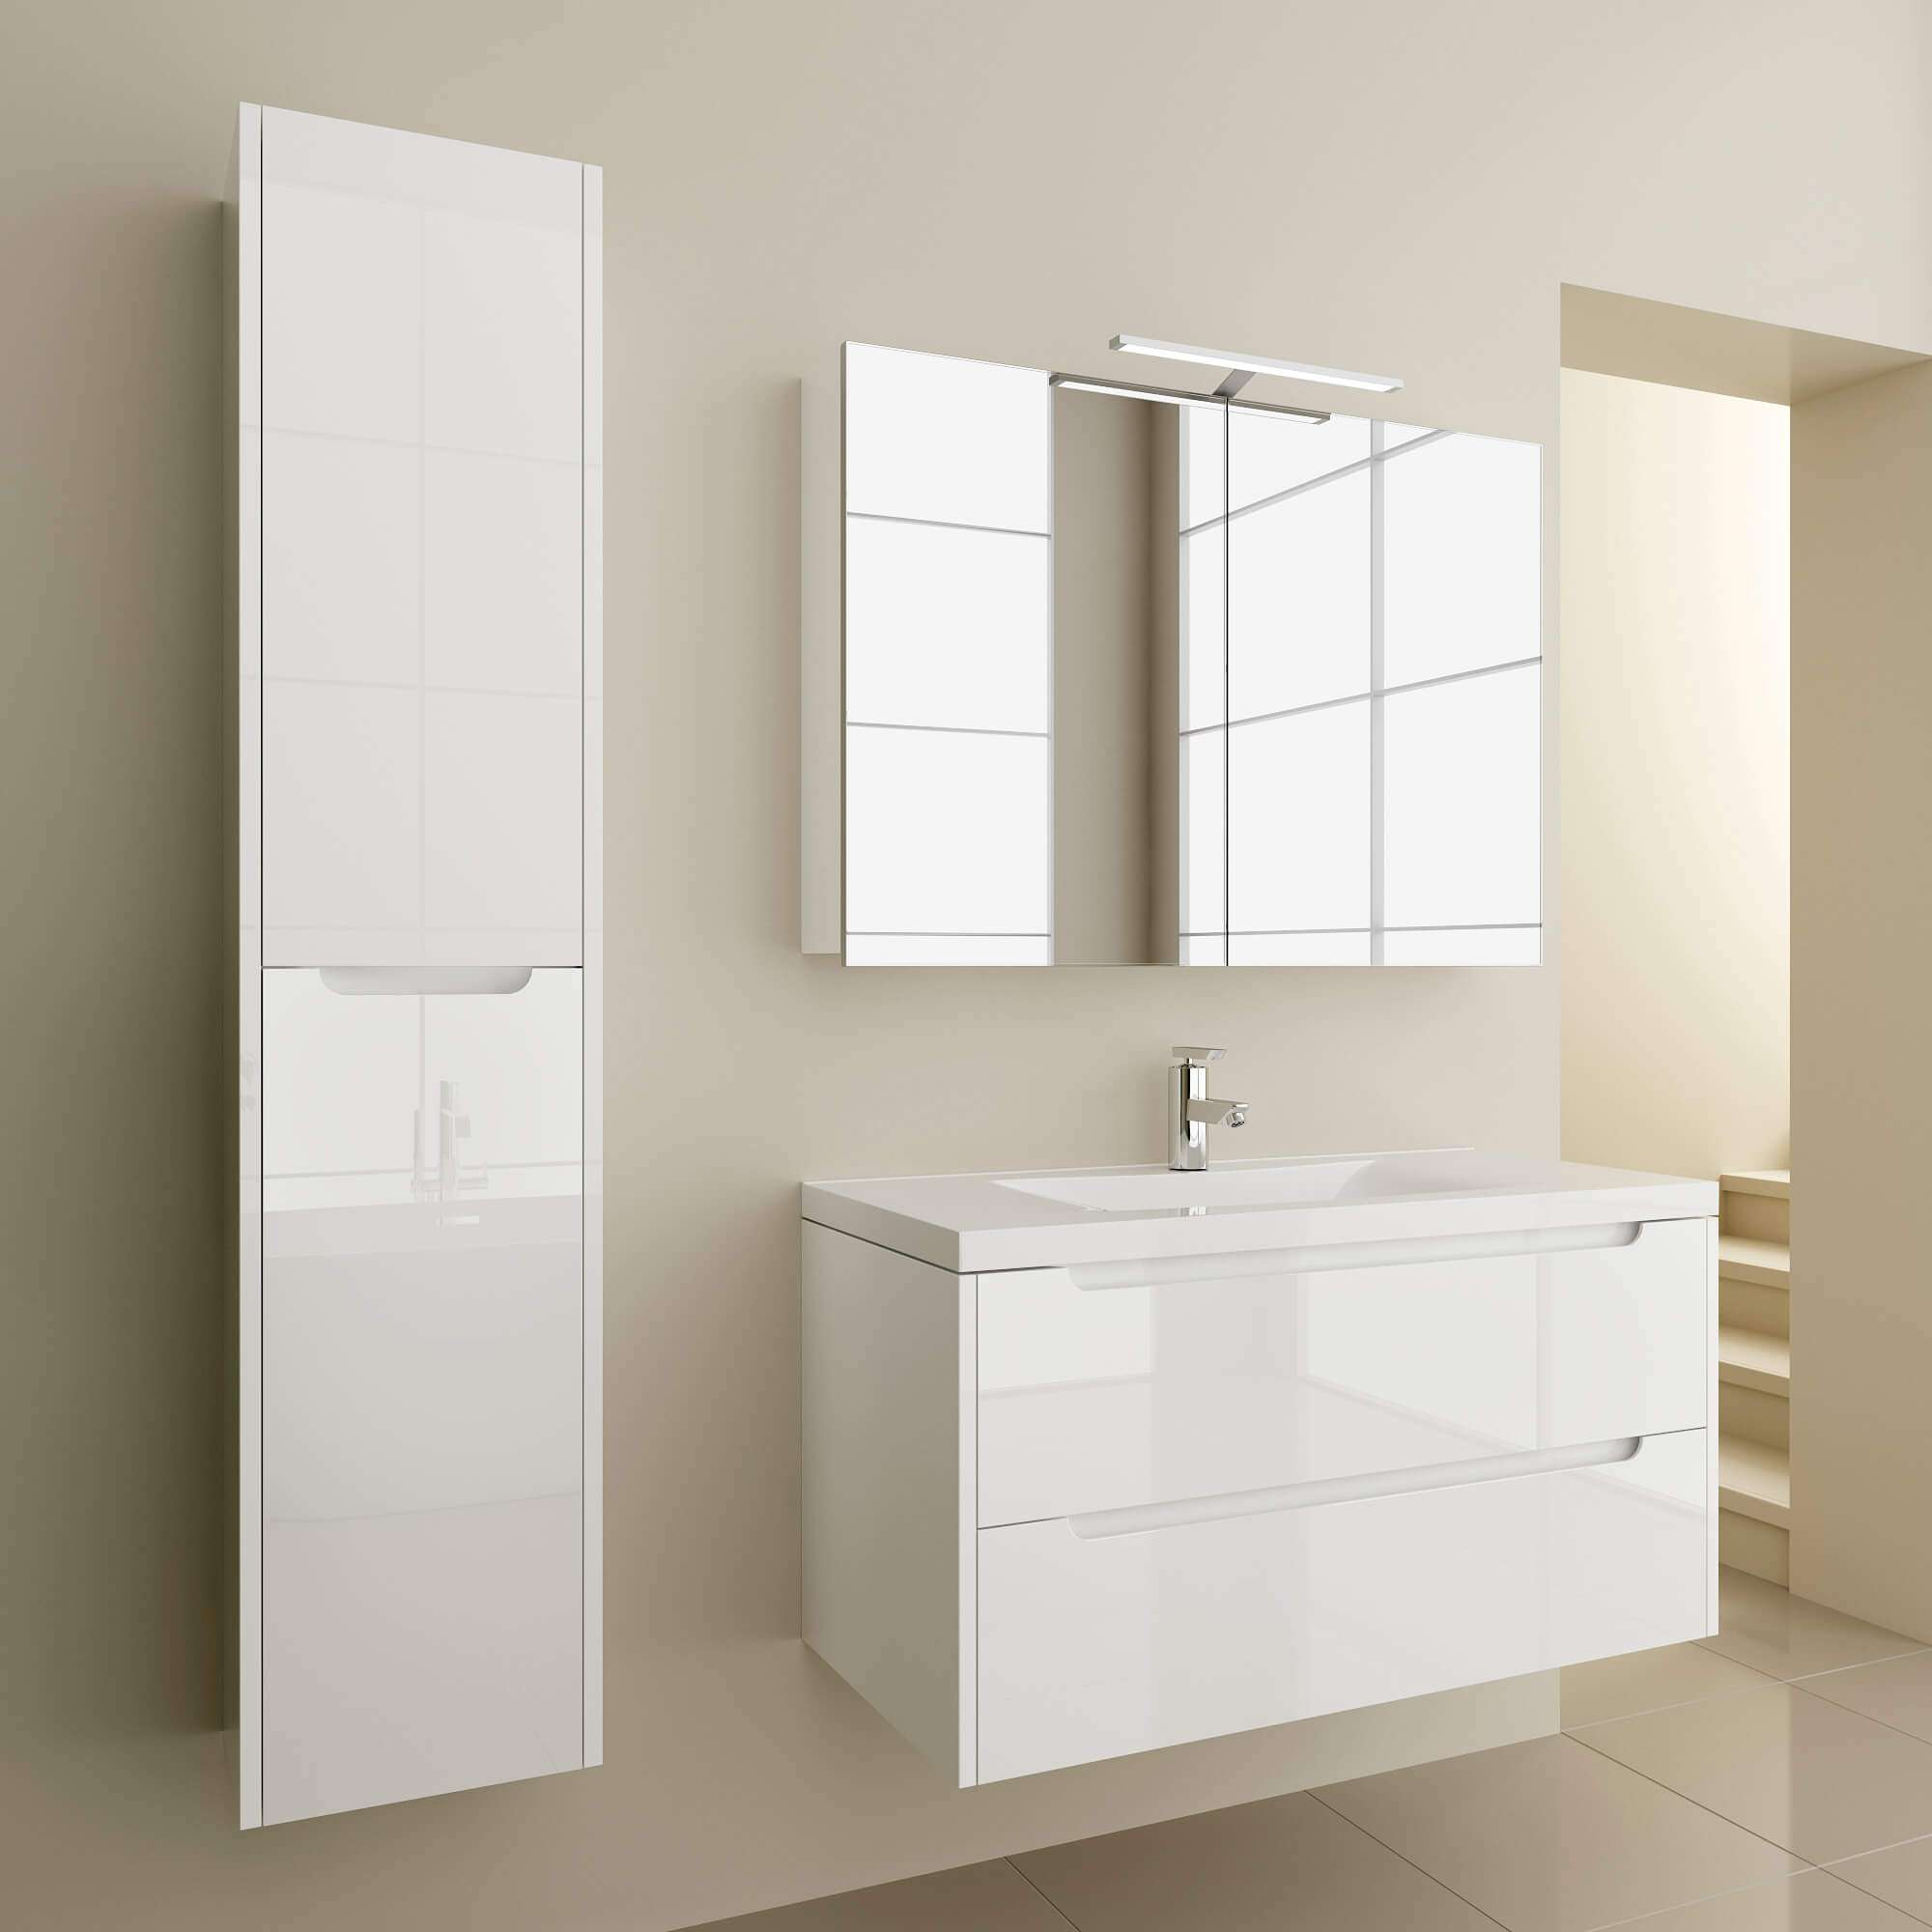 Мебель для ванной комнаты - зеркала, тумбы, пеналы, шкафы в Минске | 2000x2000